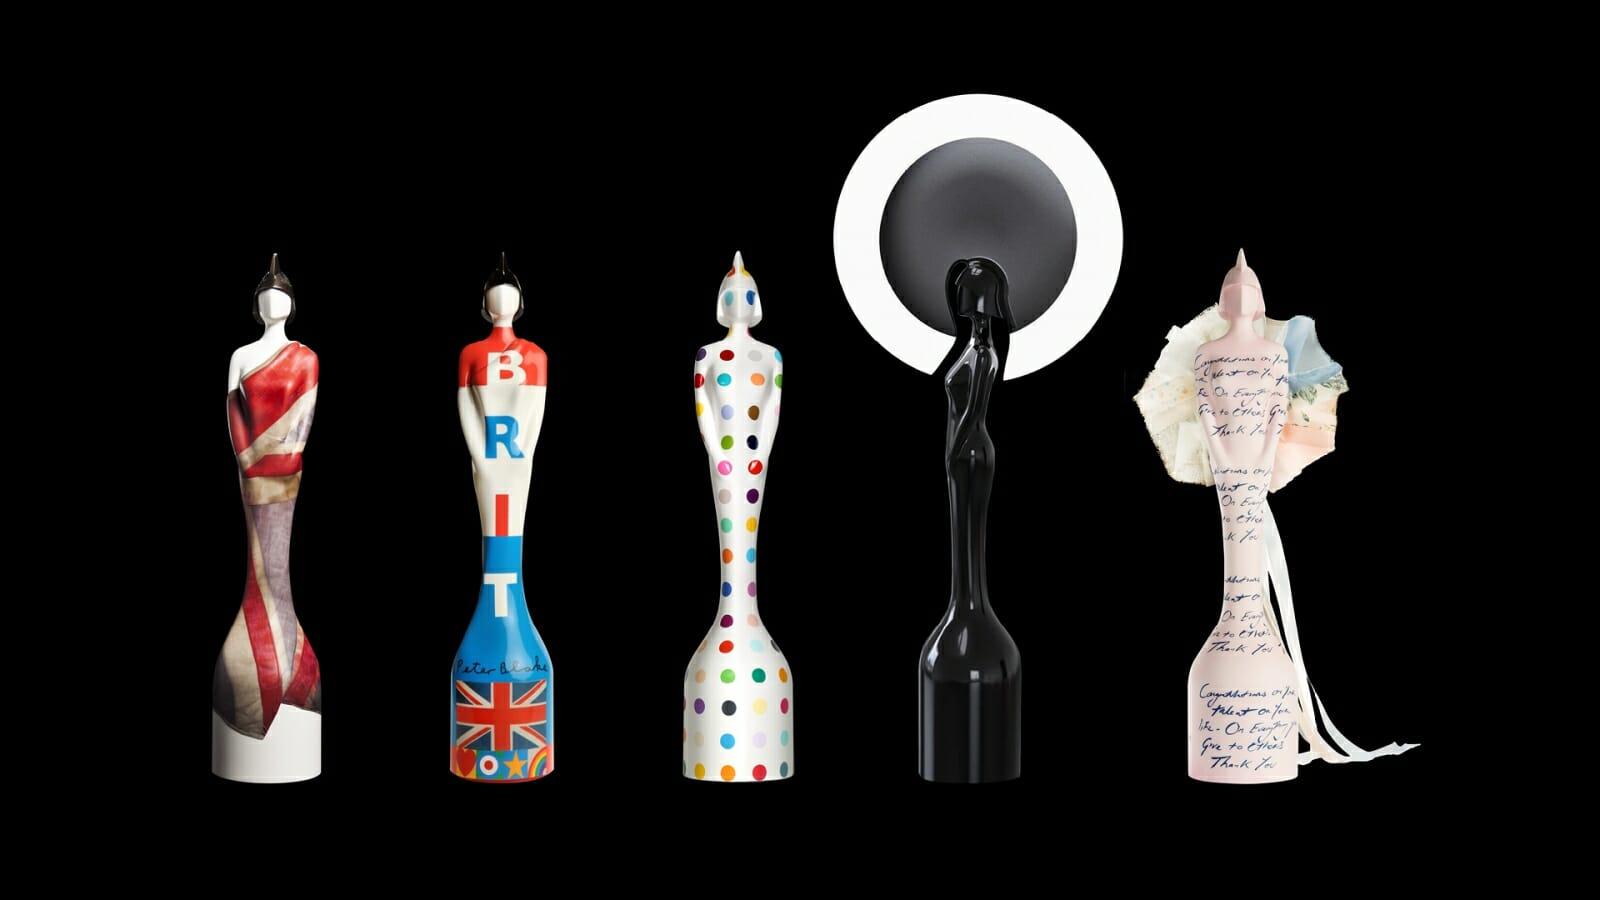 brit awards 2019 - HD1600×900